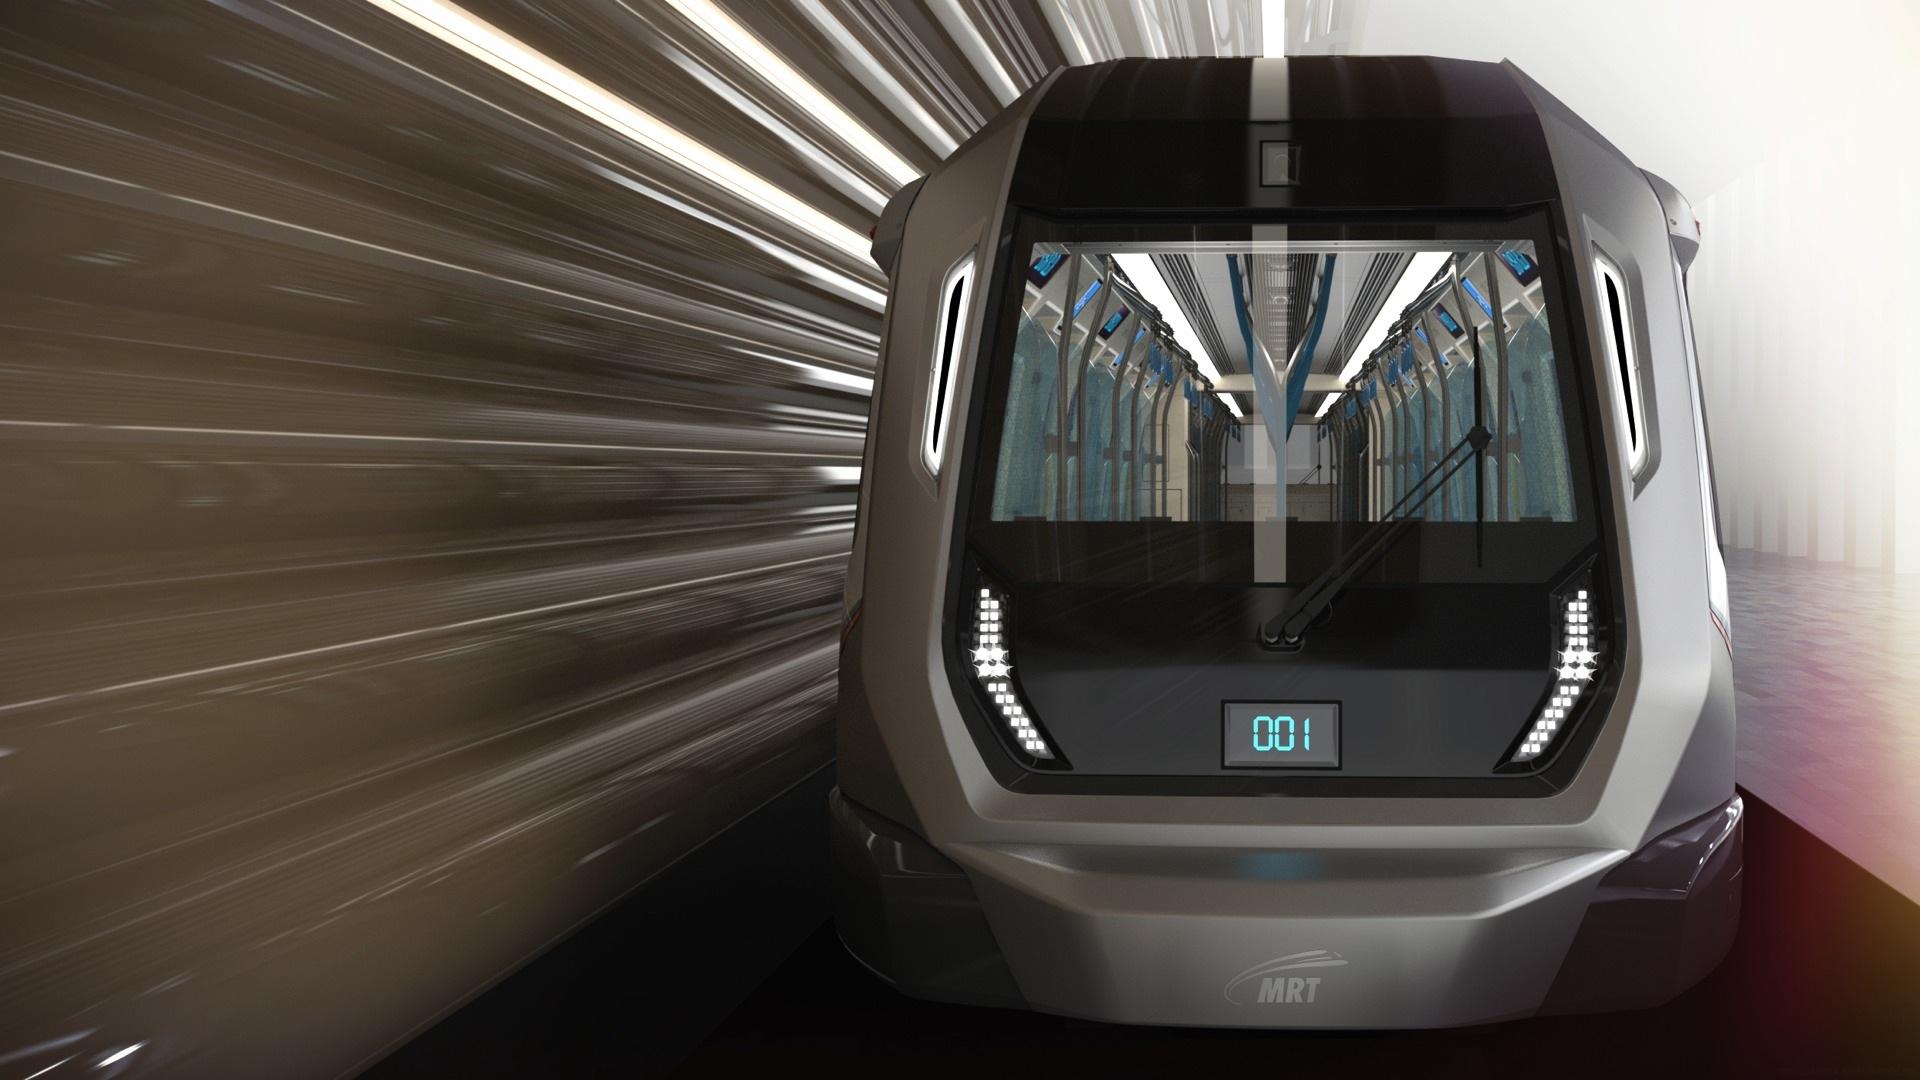 Malaysia To Get Bmw Designed Metro Trains Autoevolution